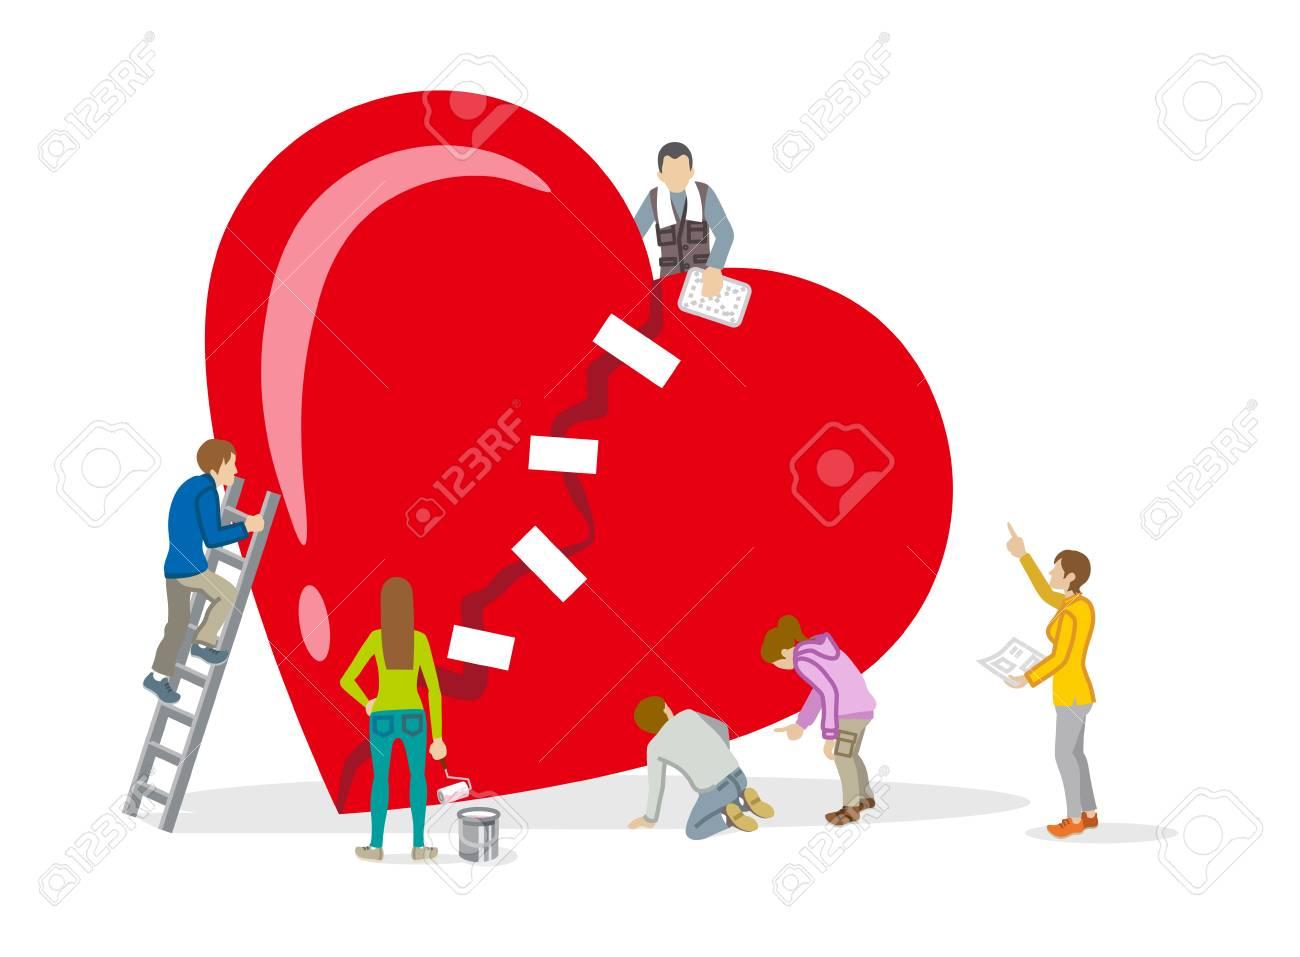 Repair of heart - Mental health Concept art - 92432968